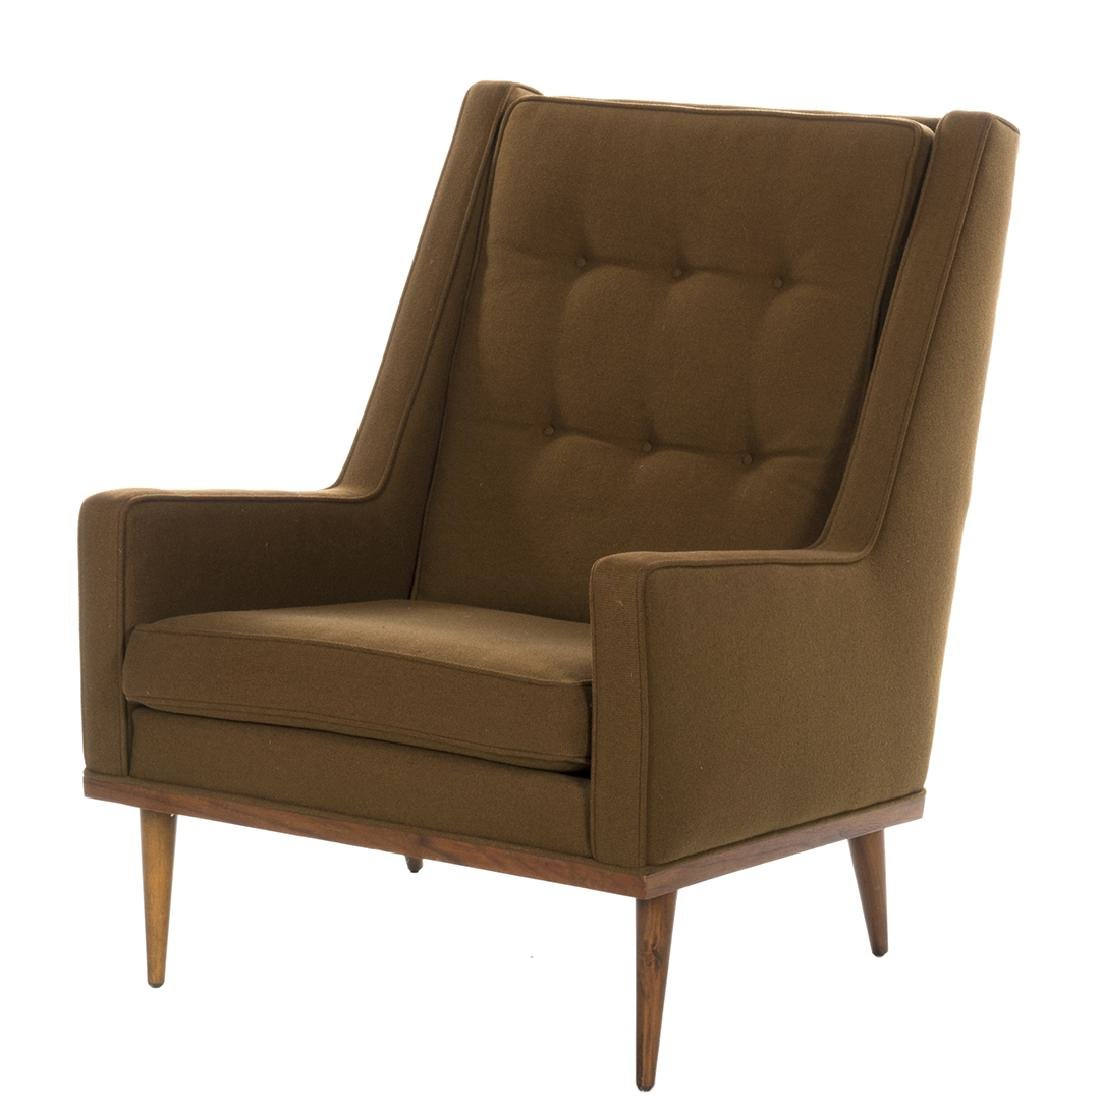 Milo Baughman Lounge Chair